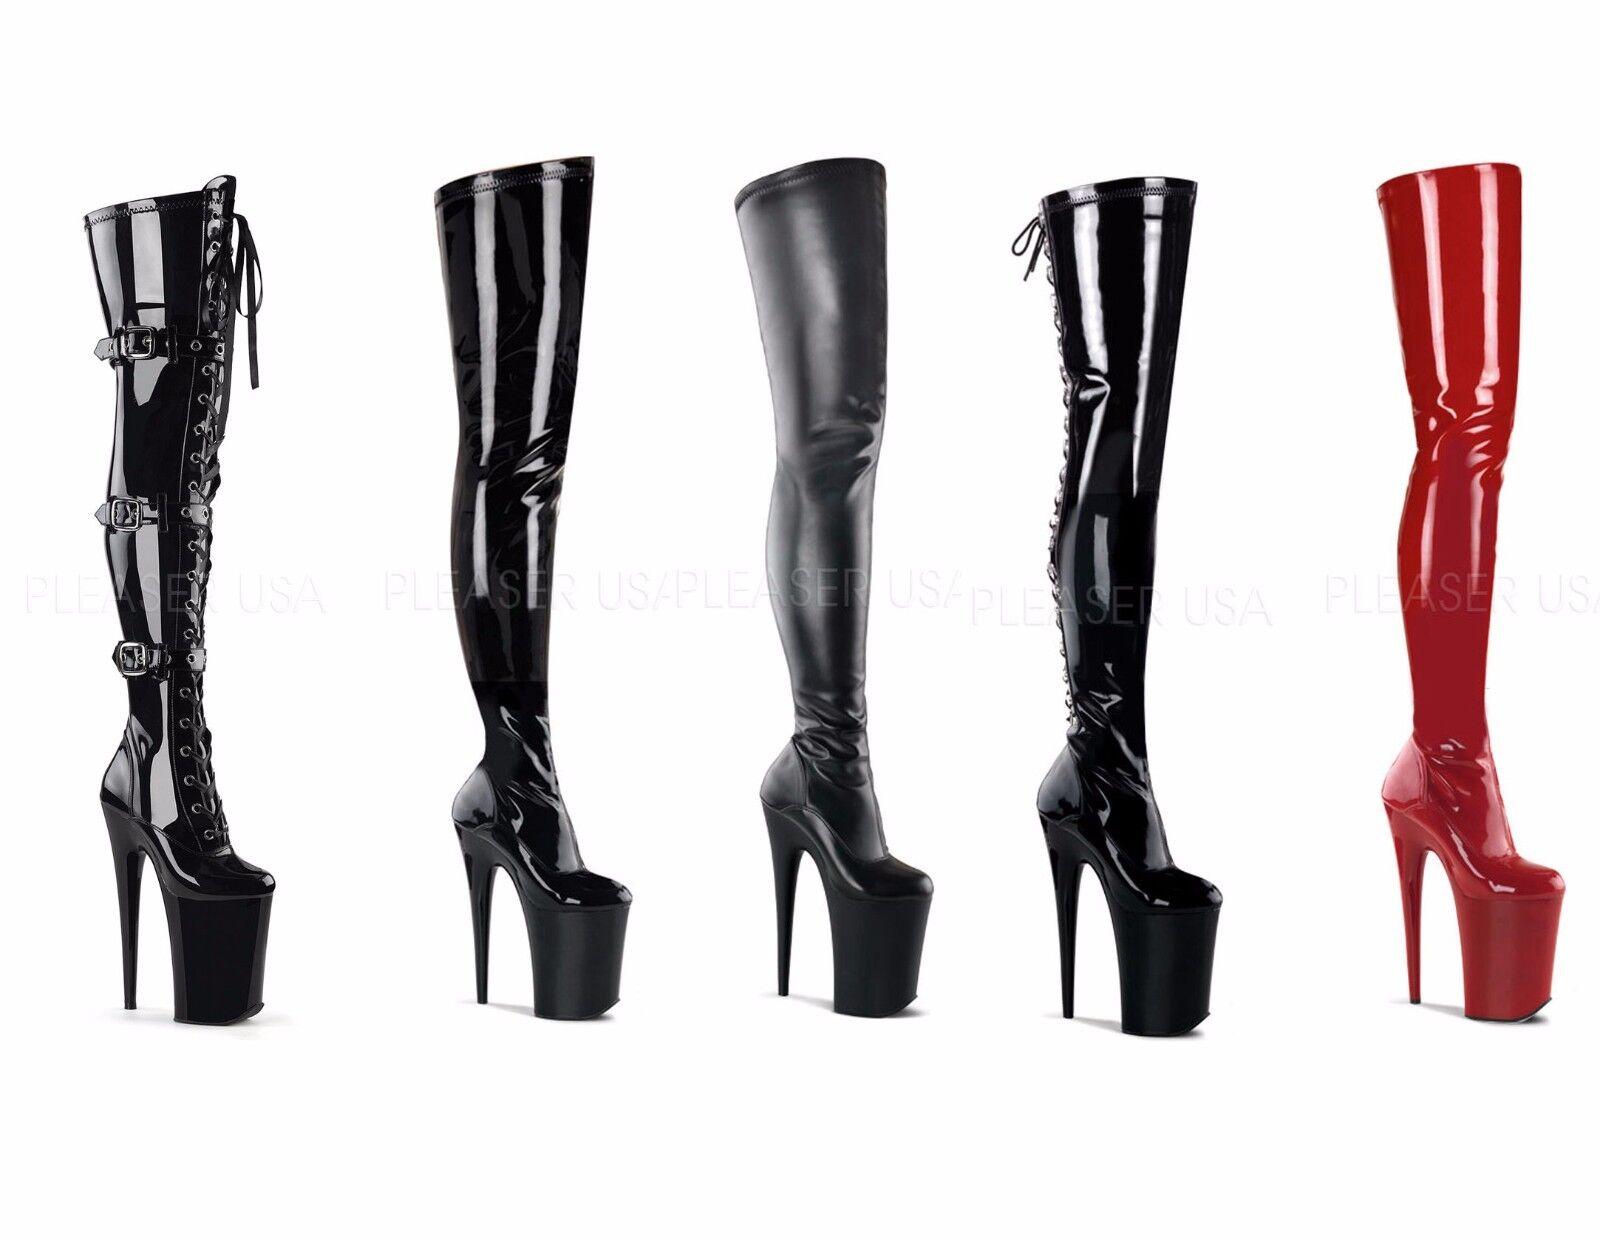 Pleaser INFINITY-3028 Exotic Dancing 9  Heel Platform Thigh High botas